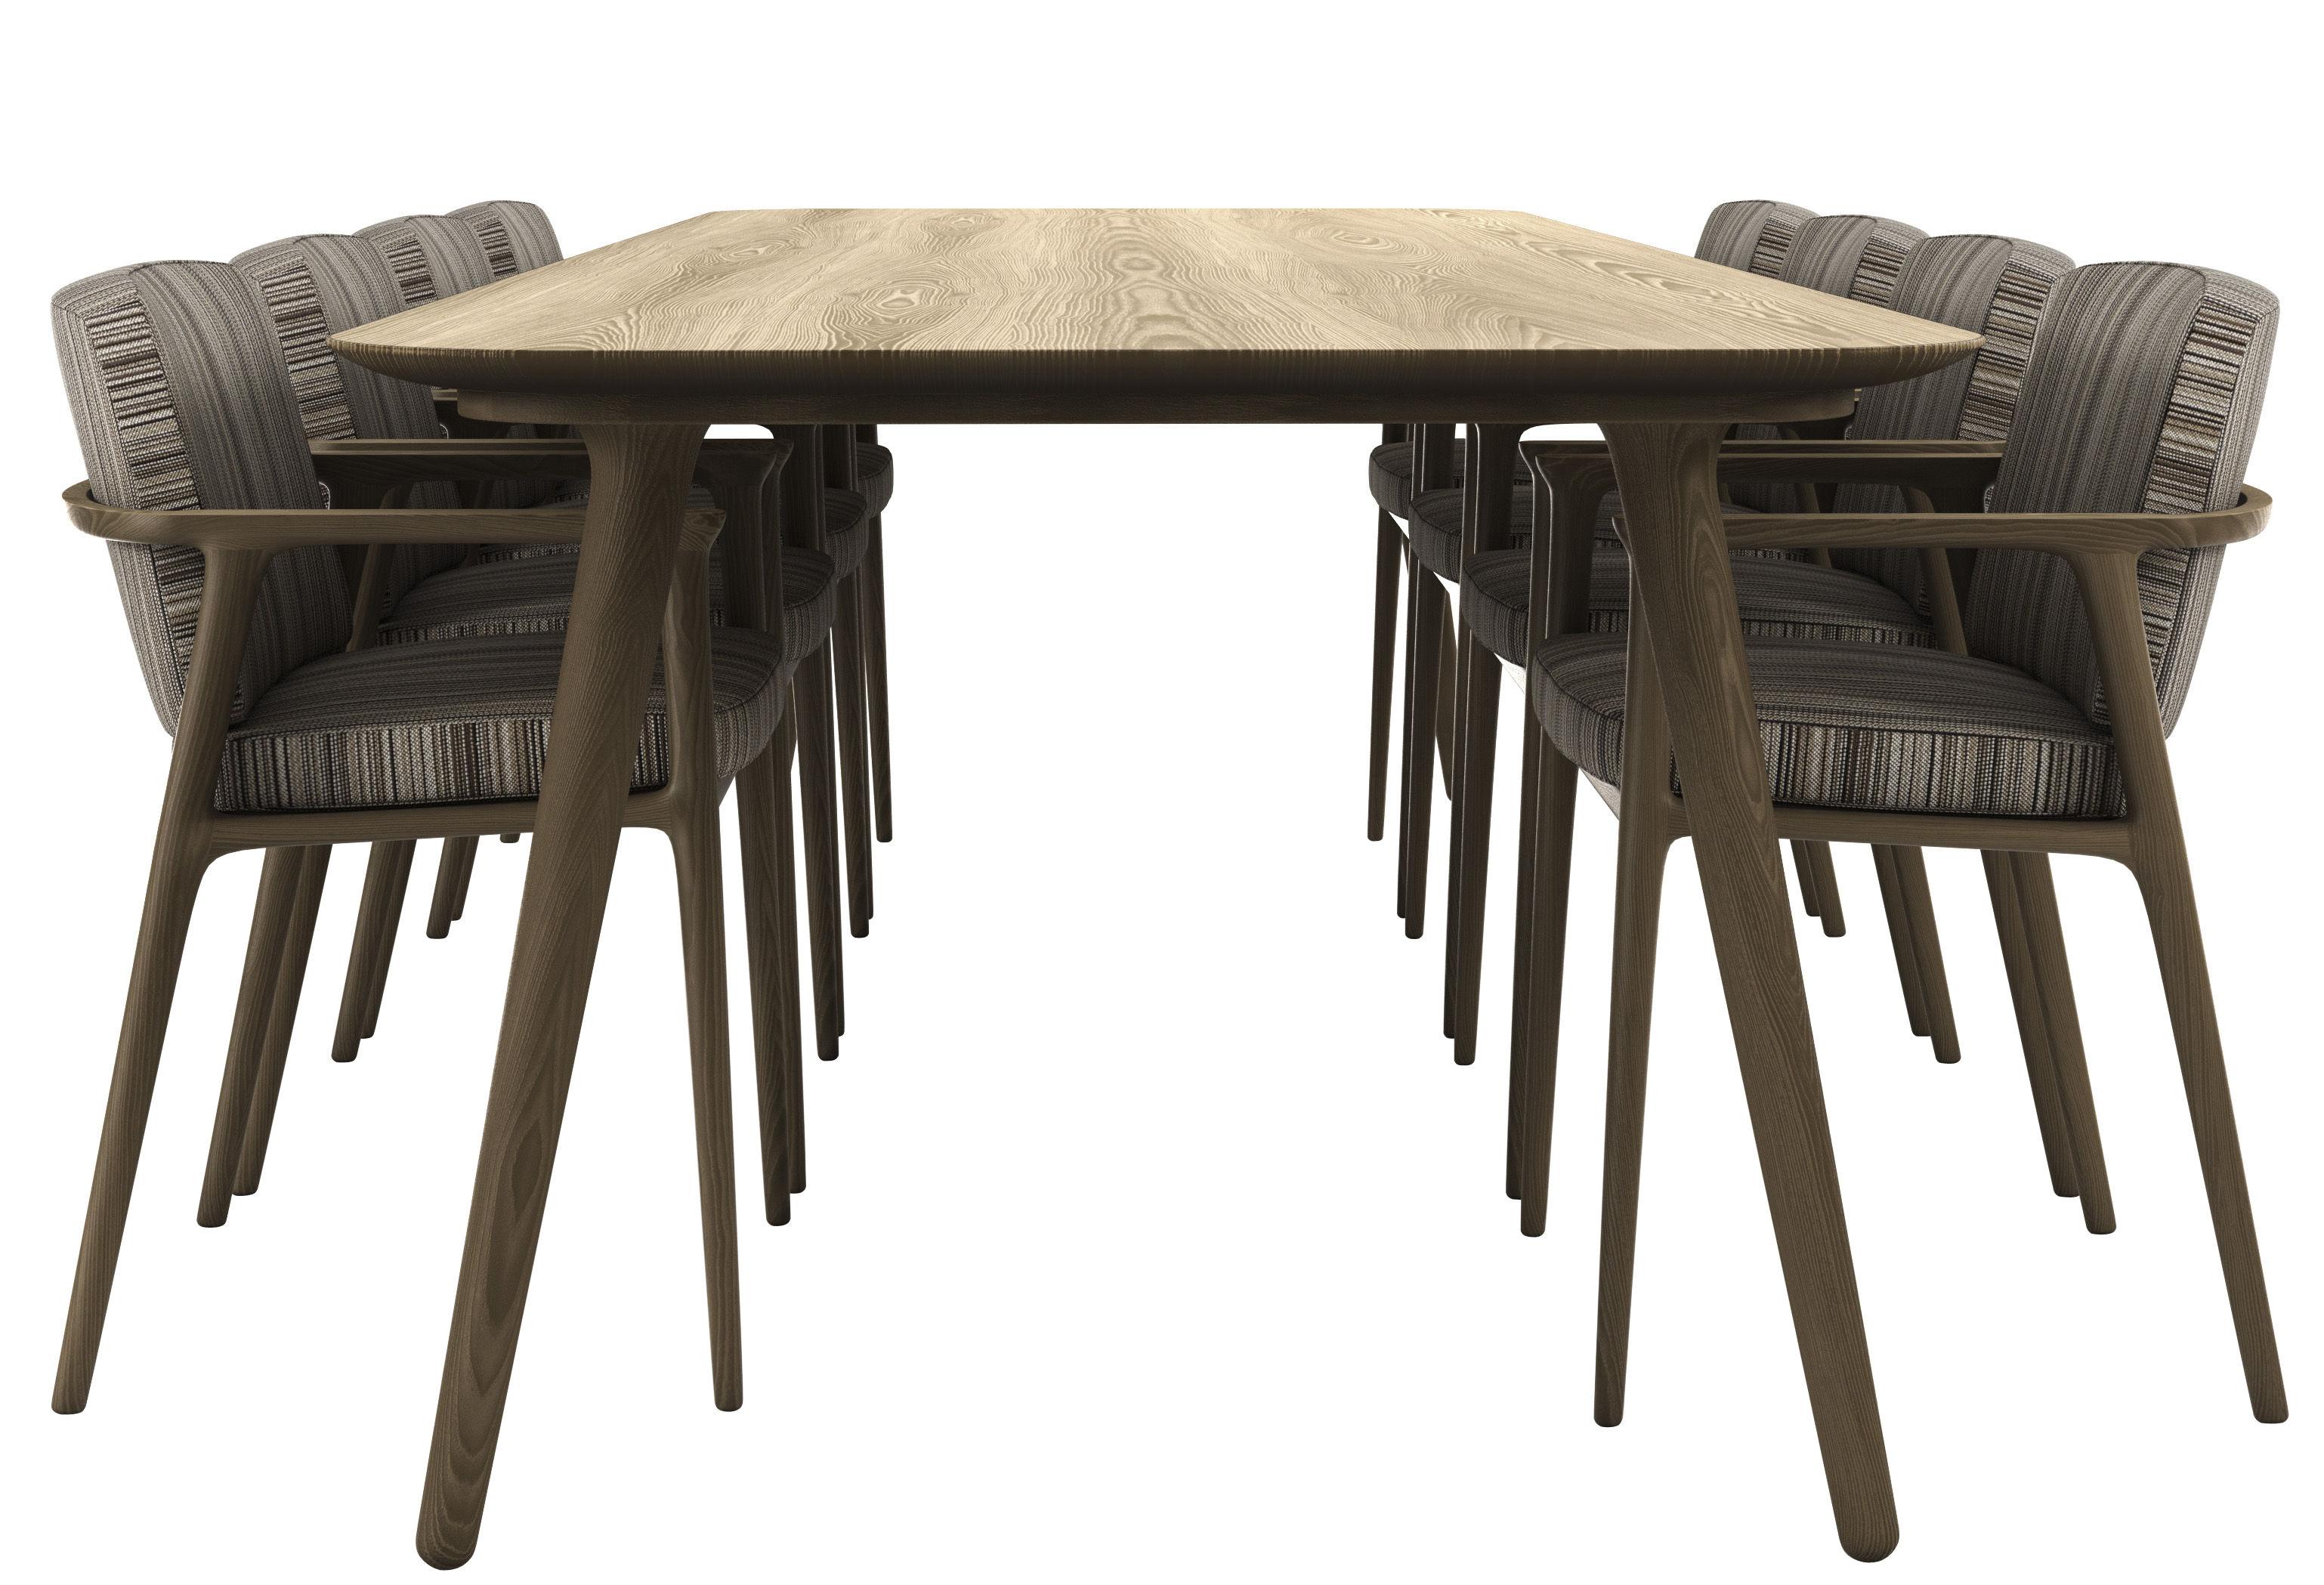 Mobilier - Tables - Table rectangulaire Zio / 190 x 90 cm - Moooi - Chêne cannelle - Chêne massif